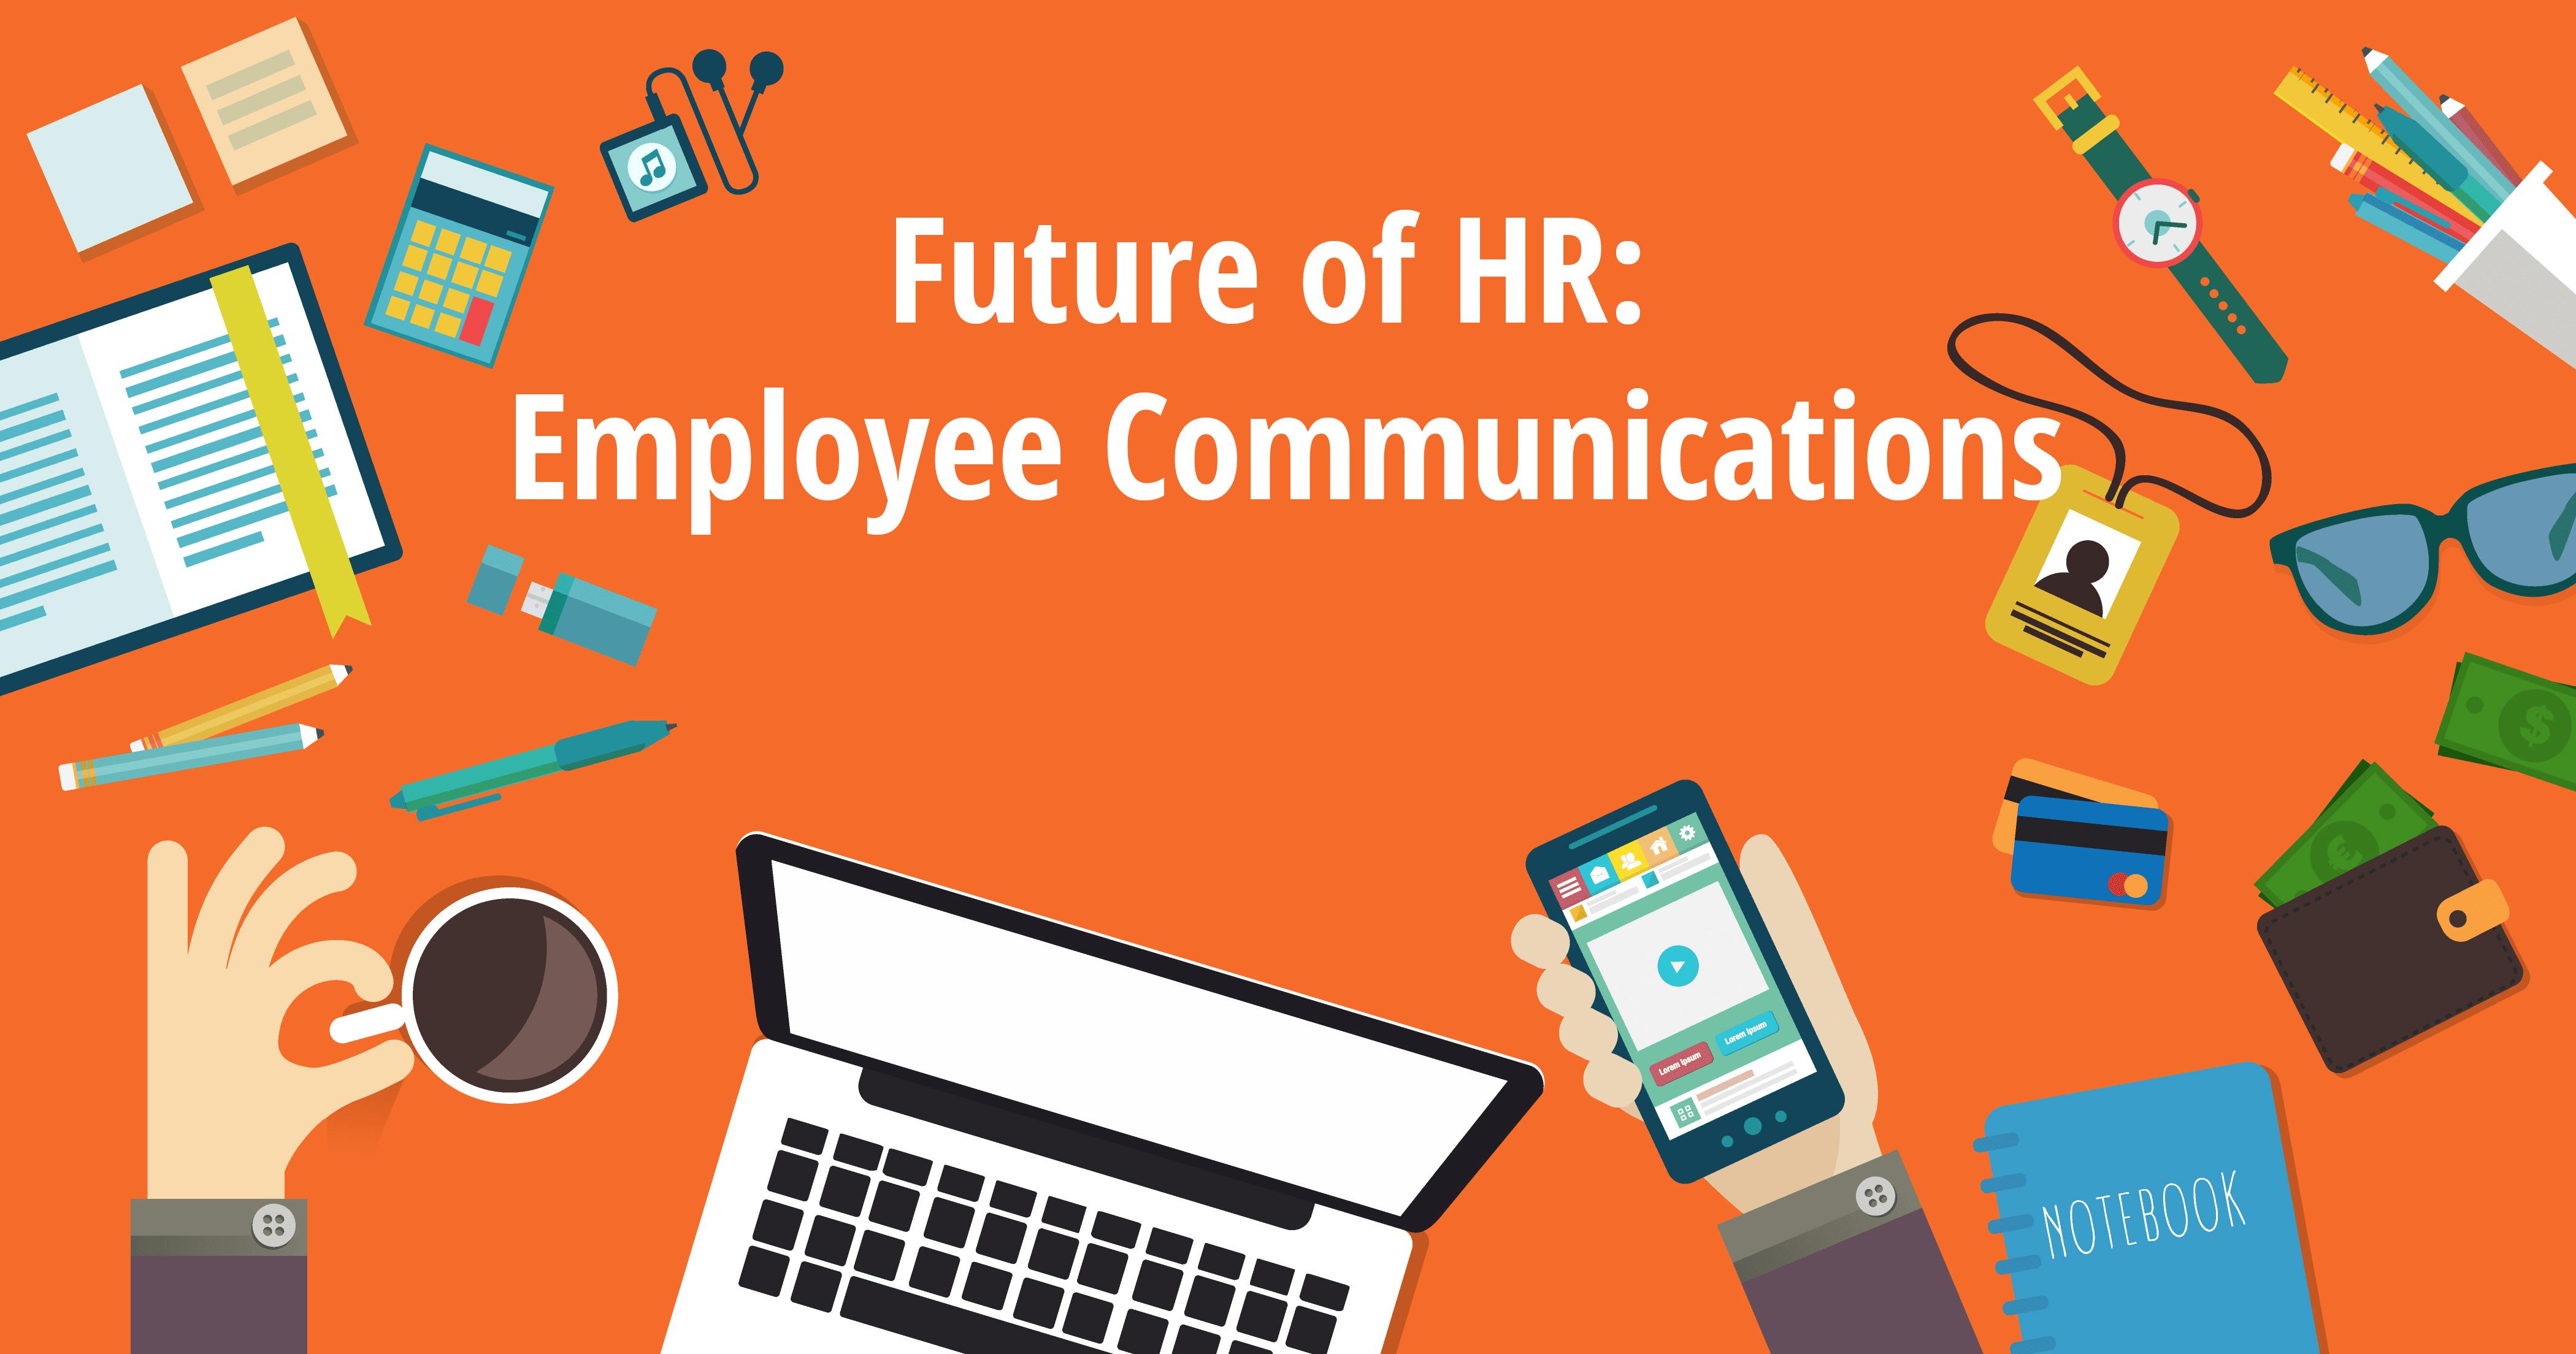 Future of HR: Employee Communications